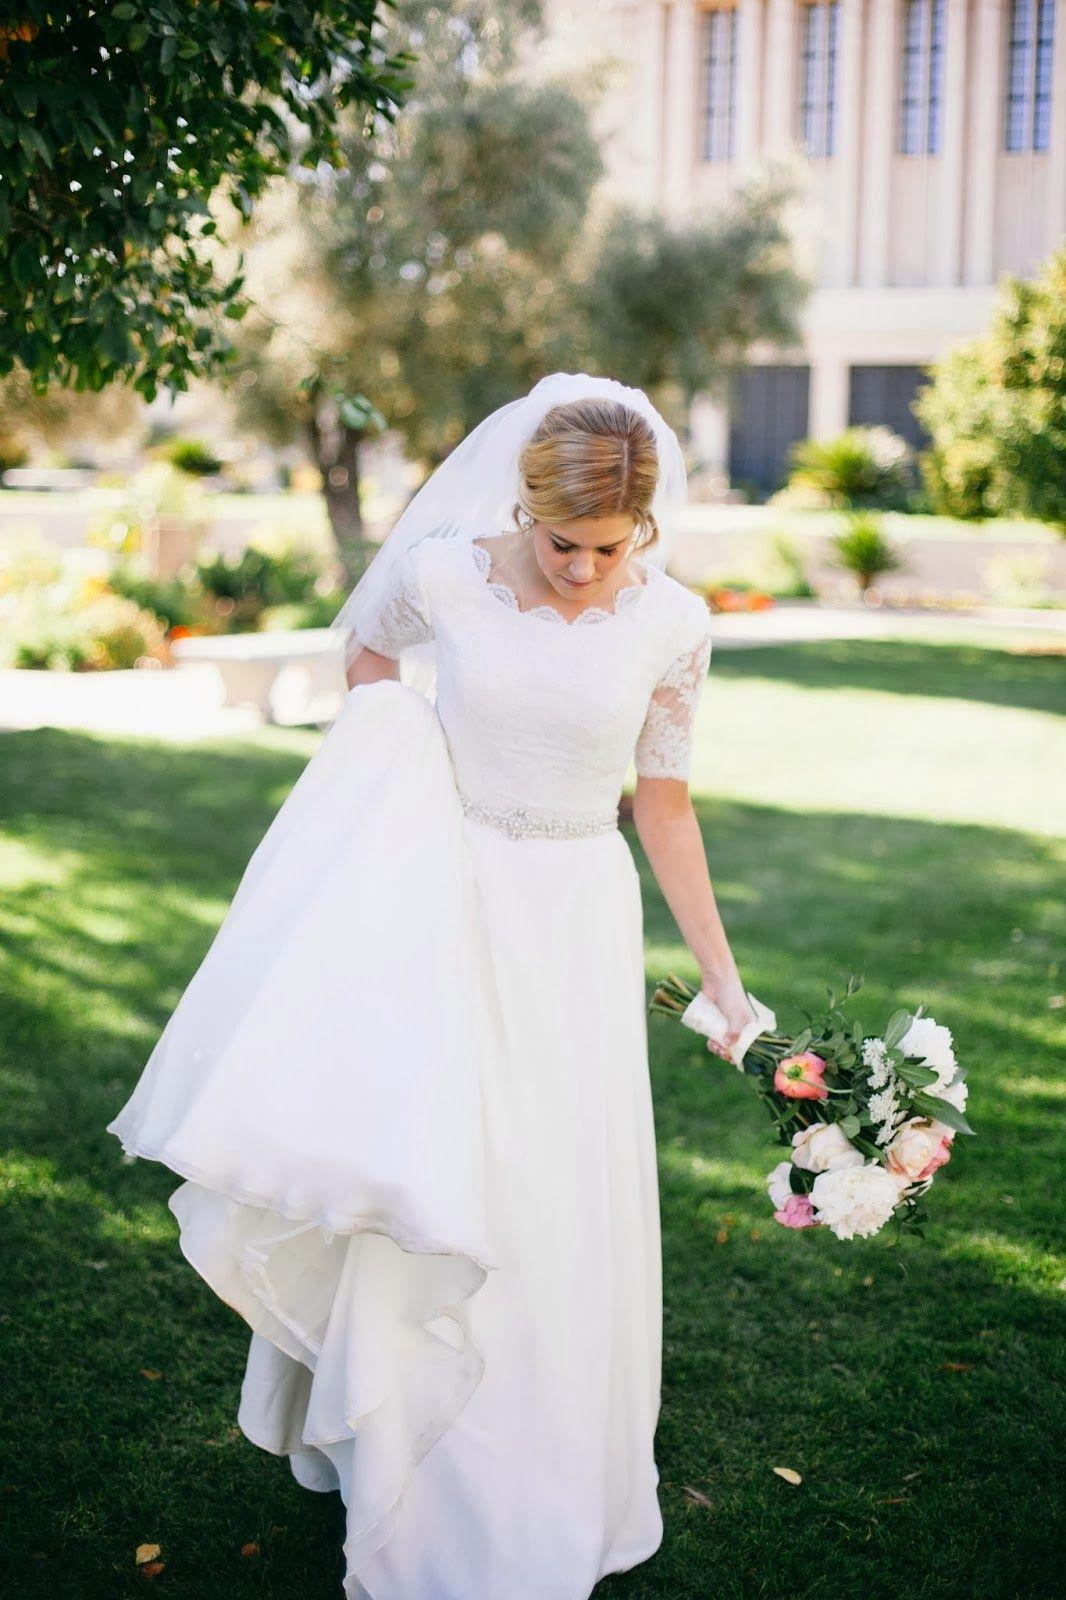 Wedding dress nip slip  The Discriminating Bride Our Bride Brimley  modest wedding dresses